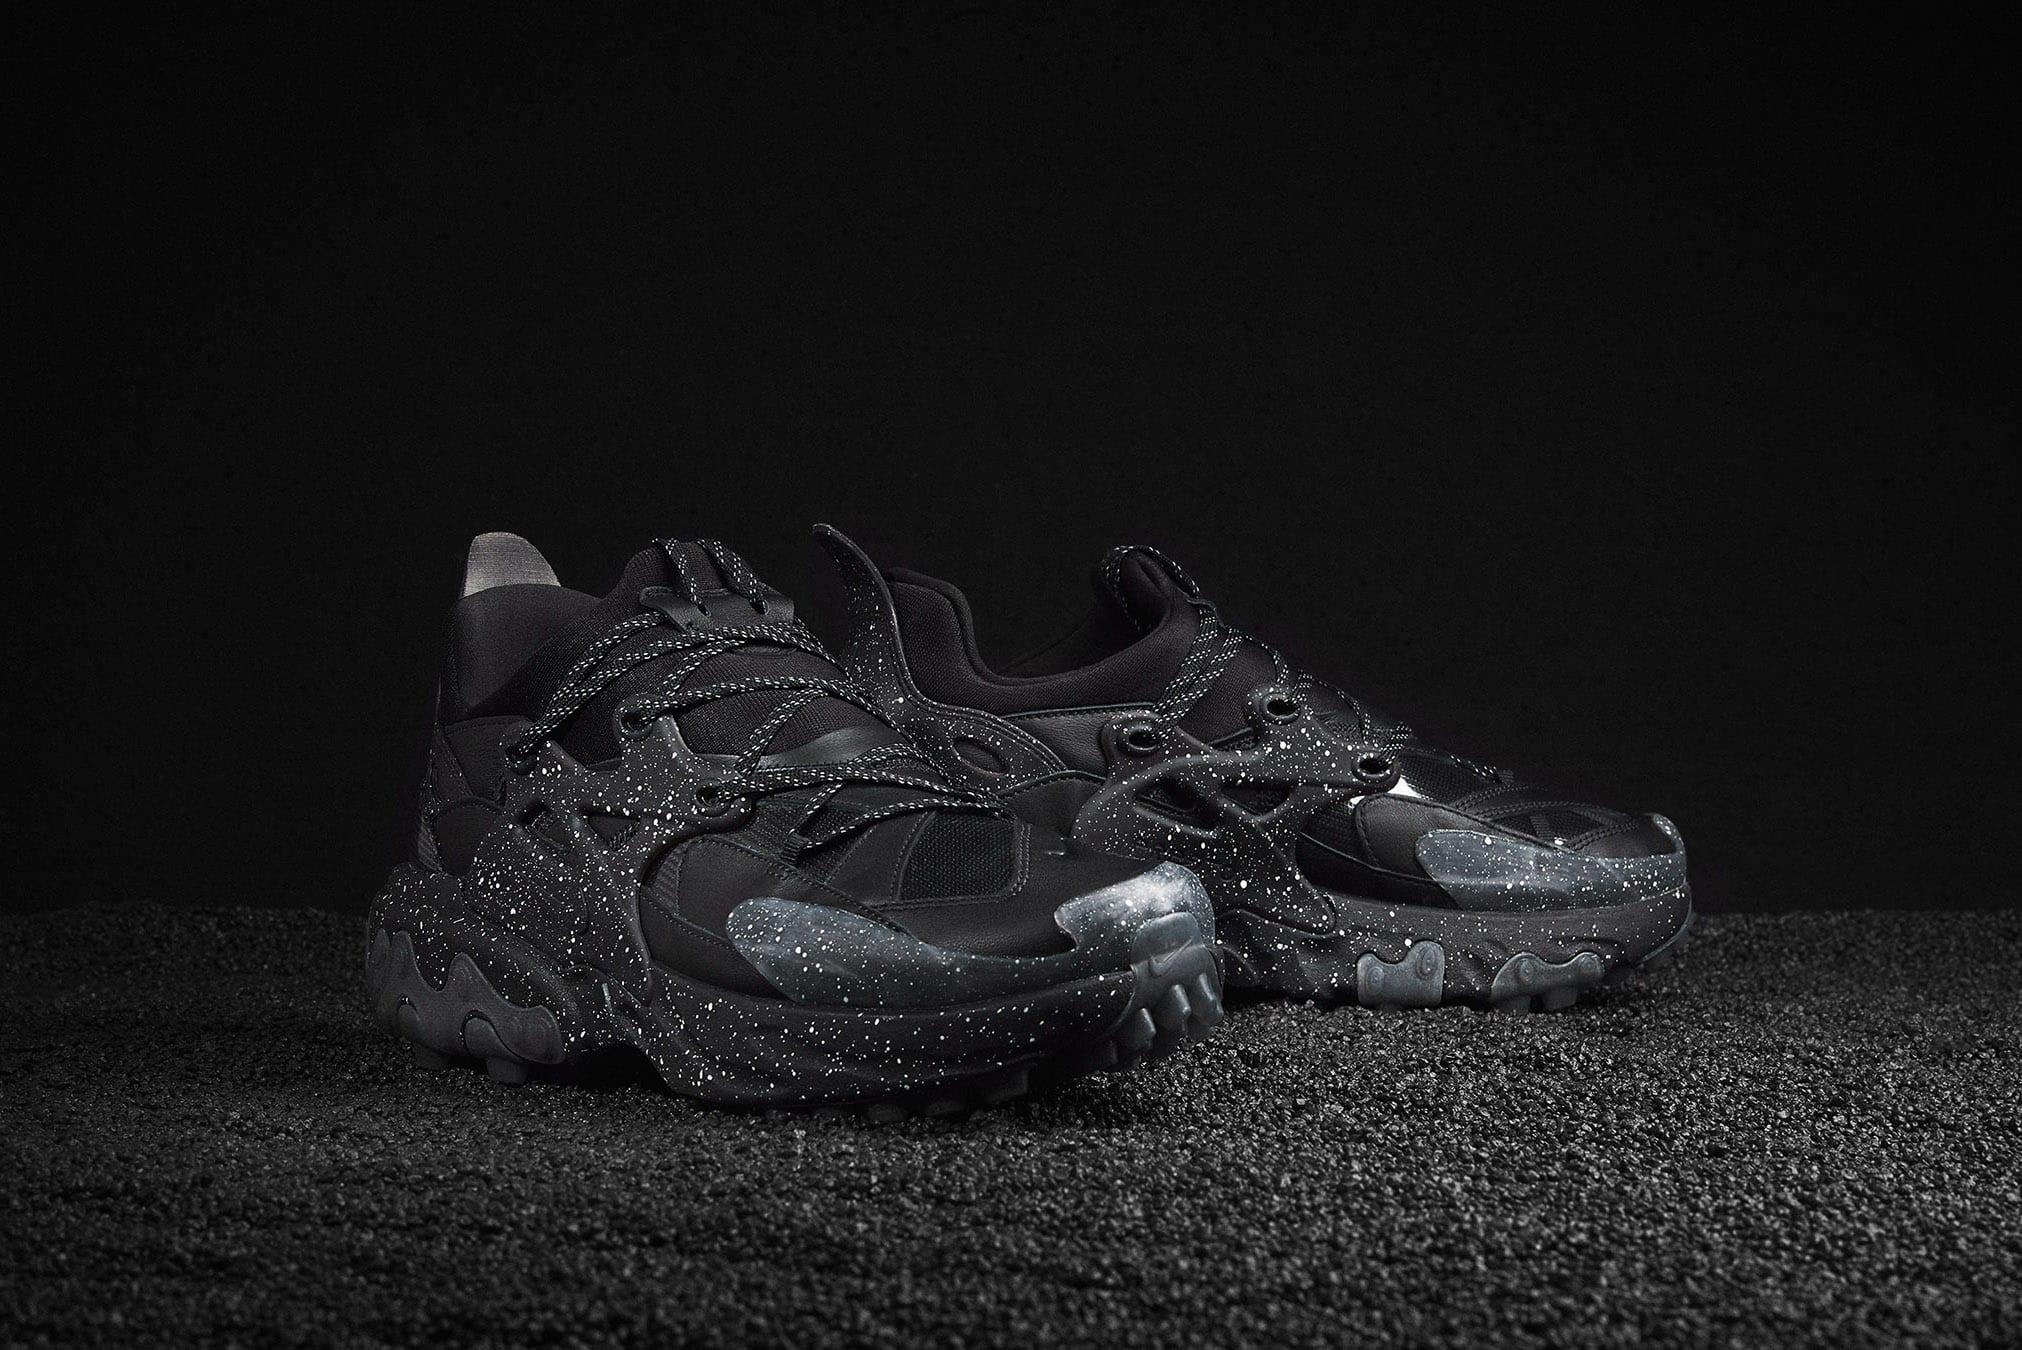 Nike x Undercover React Presto - CU3459-001